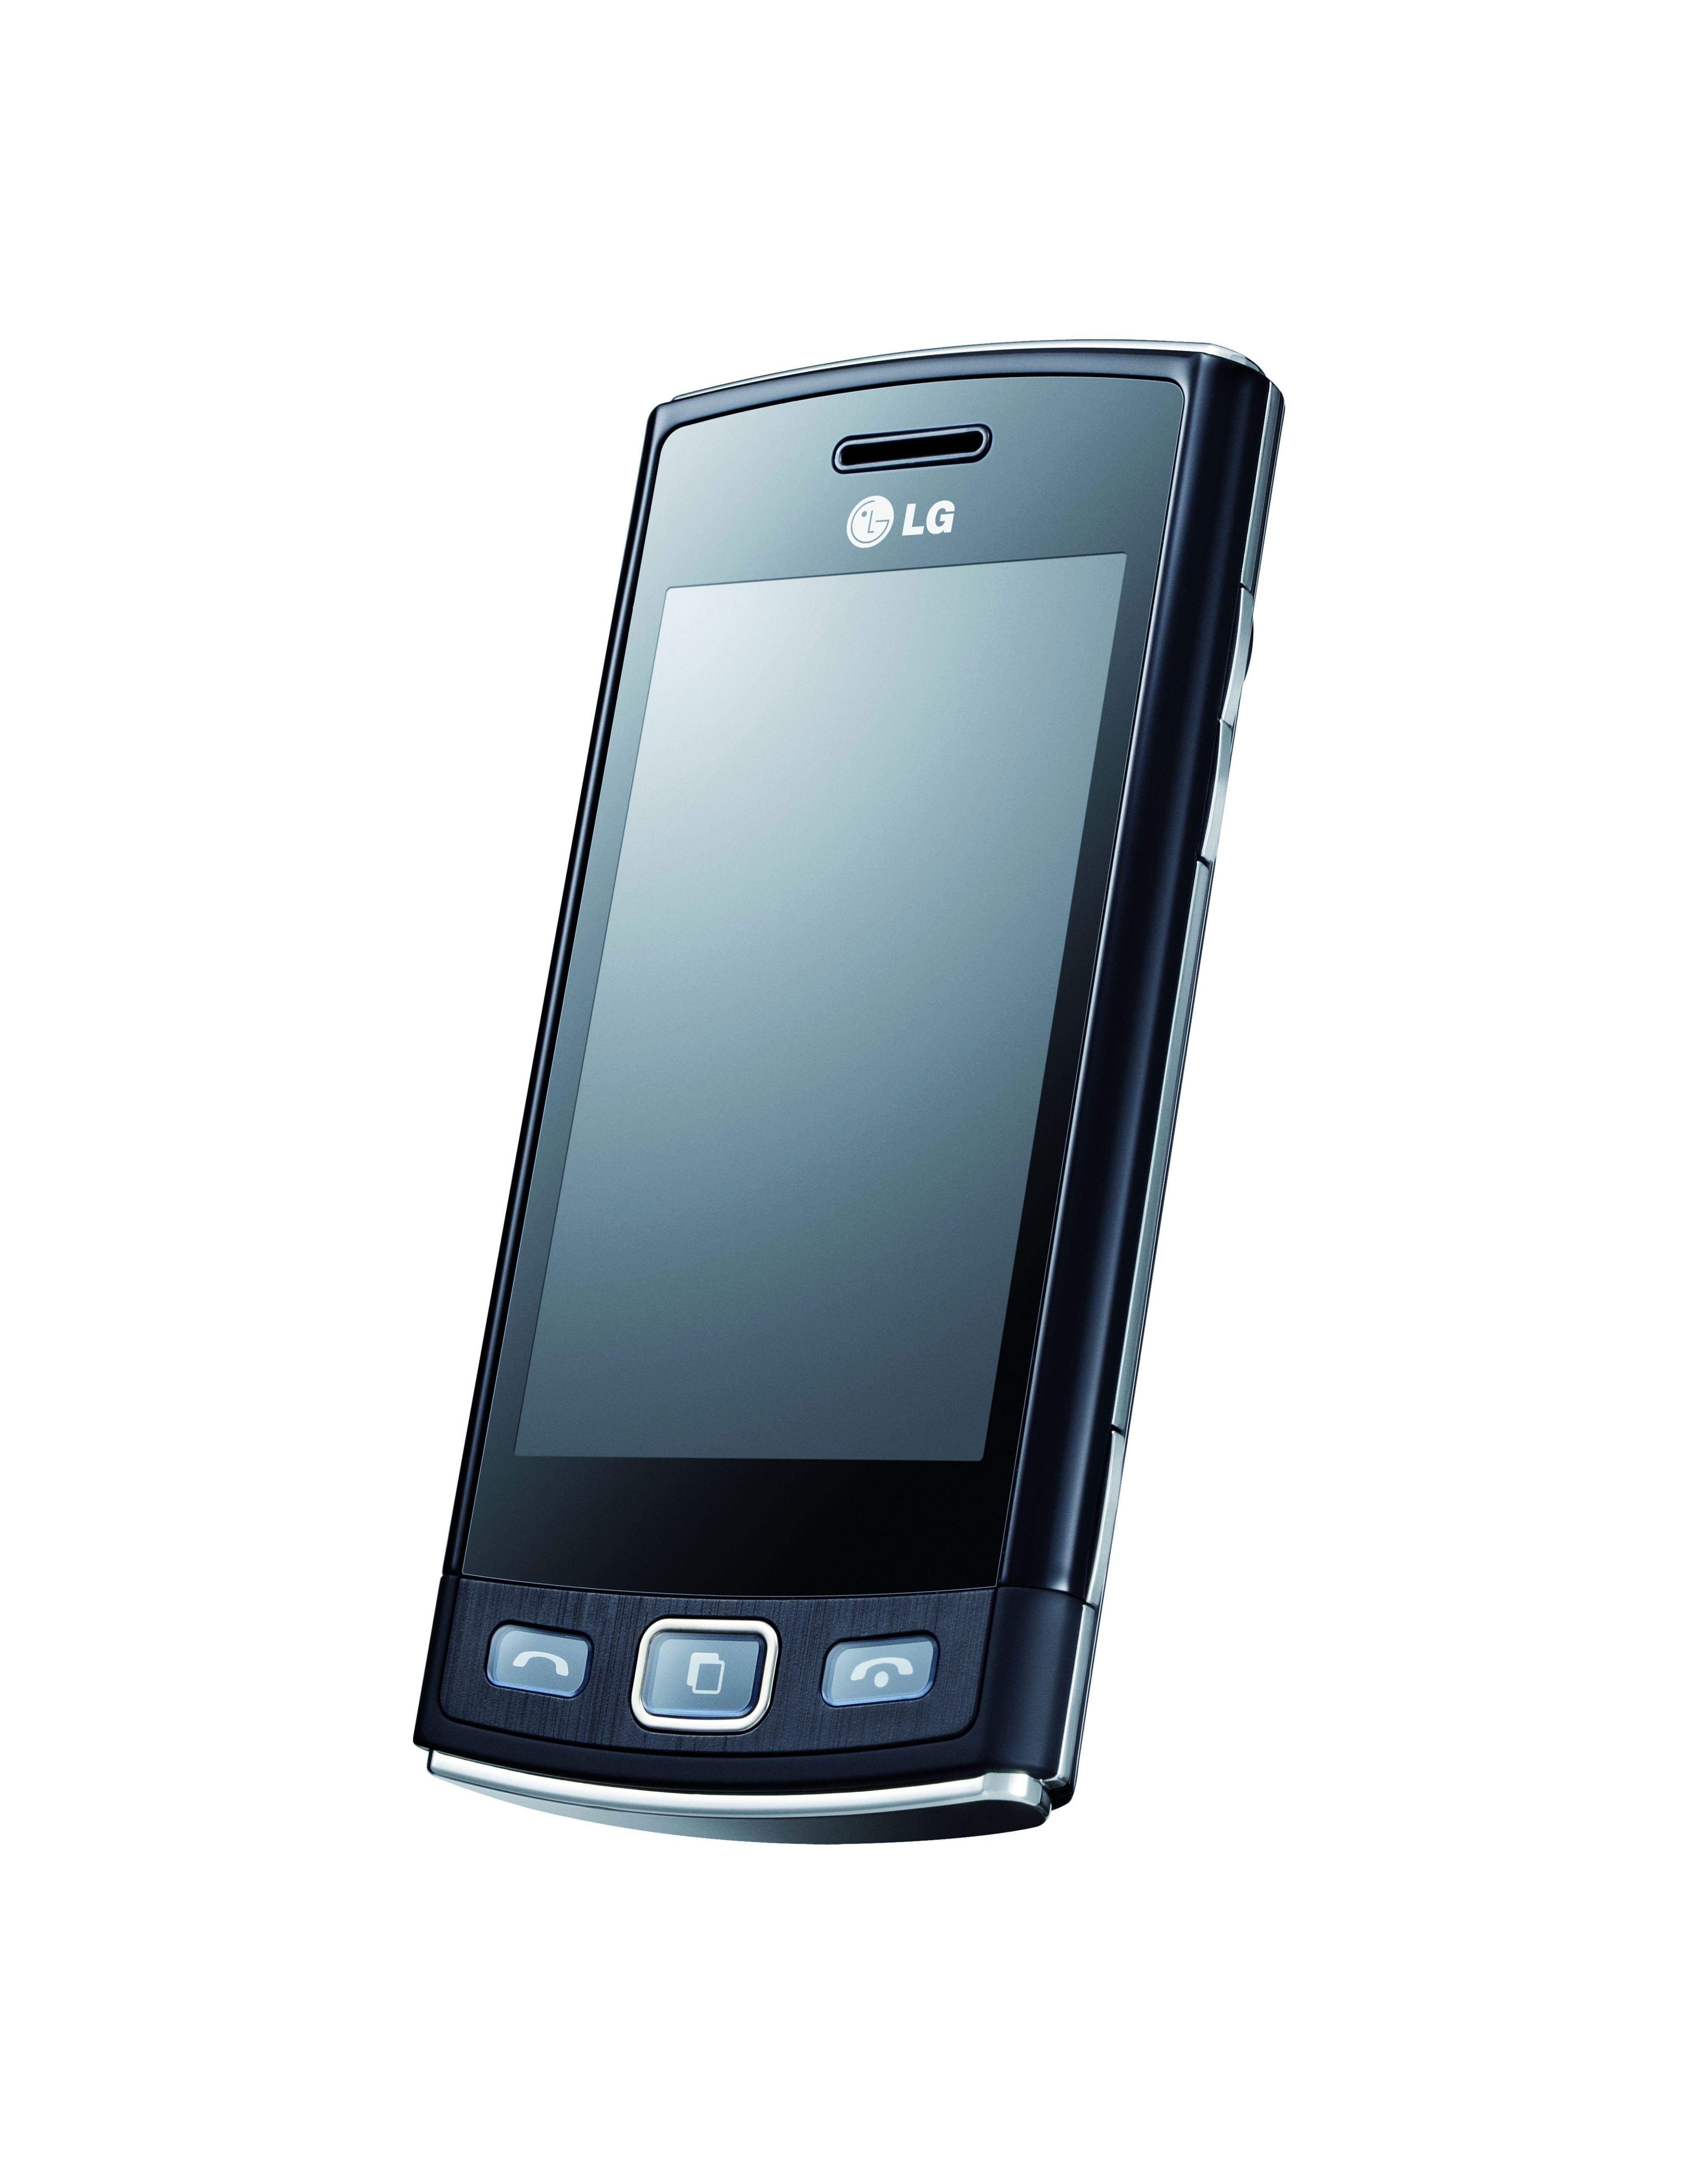 LG 國民手機,500萬畫素拍照手機 LG GM360i 、 銀髮族美型機 LG KF301